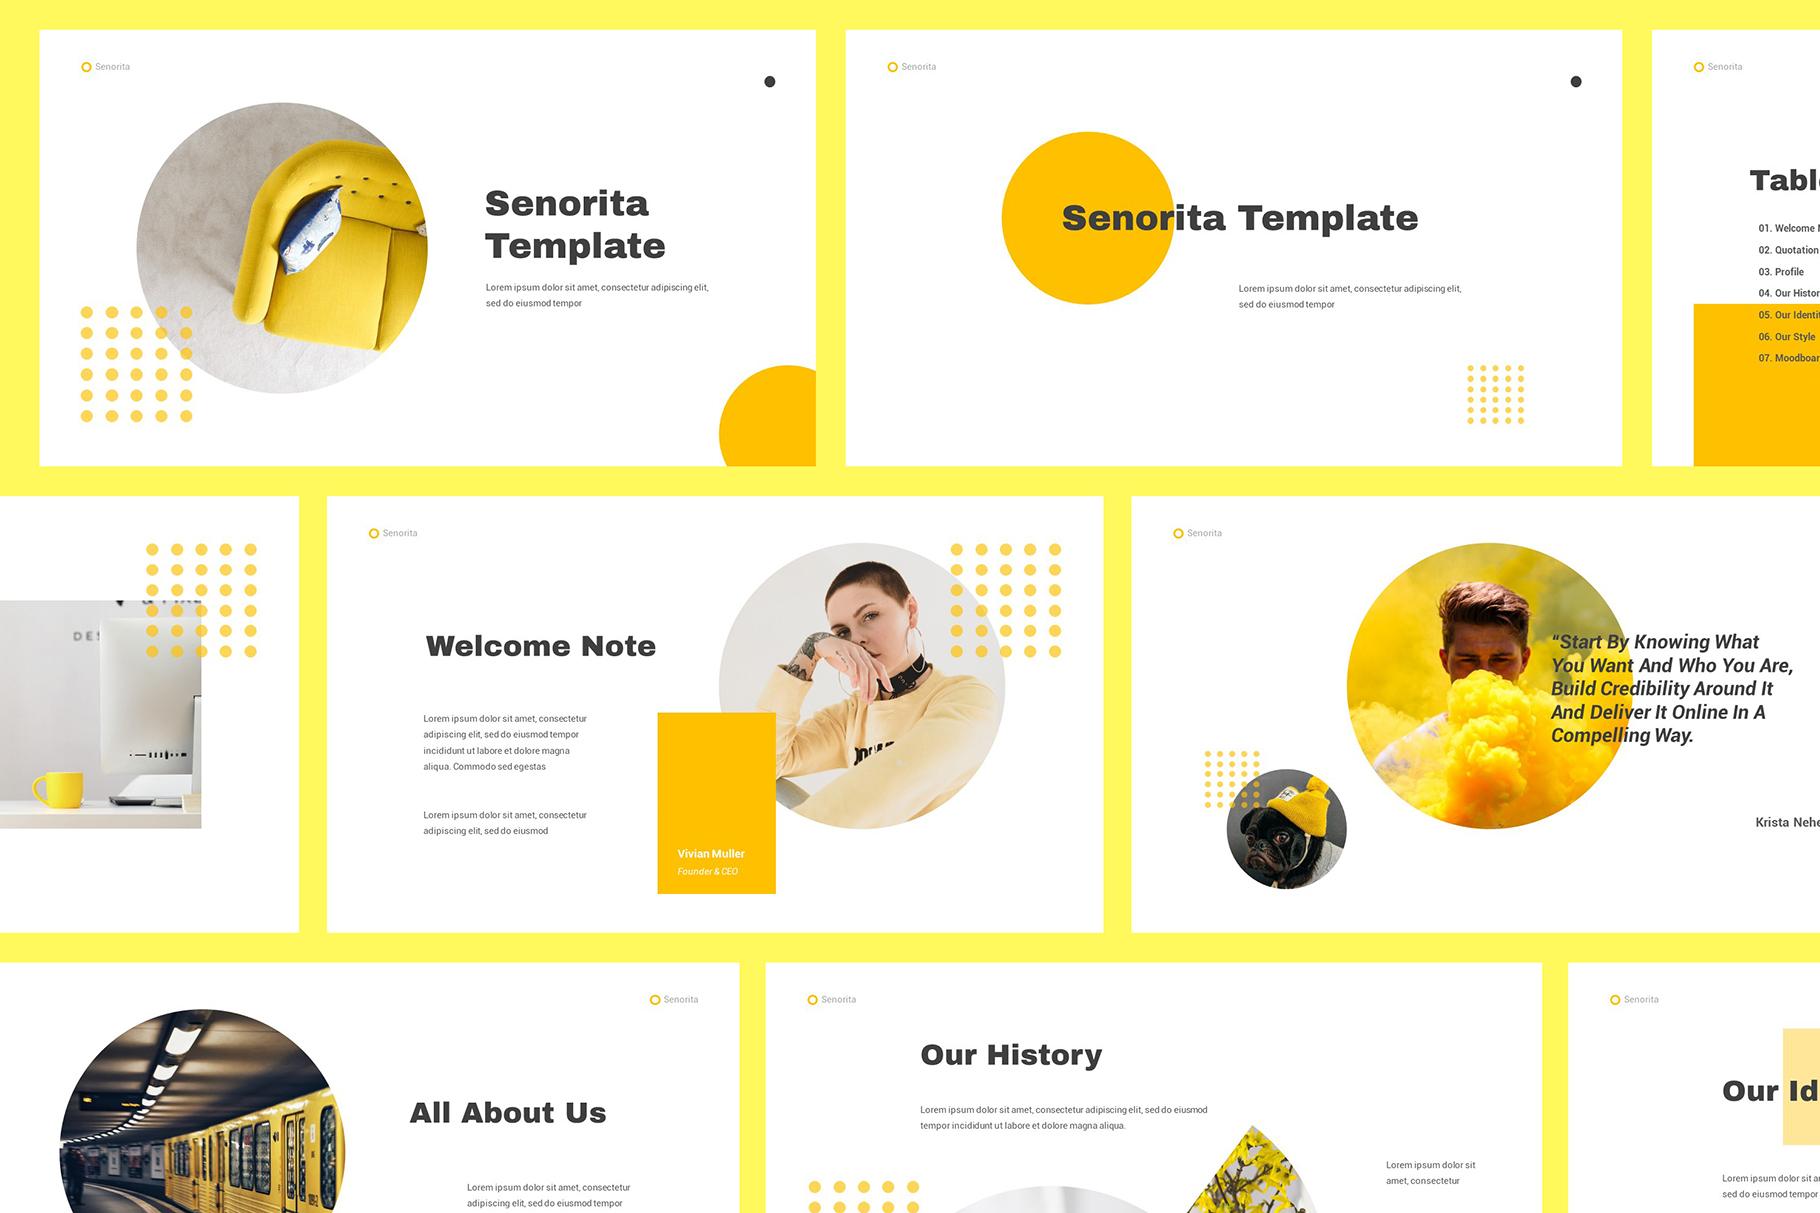 Senorita Brand Guideline Keynote example image 2